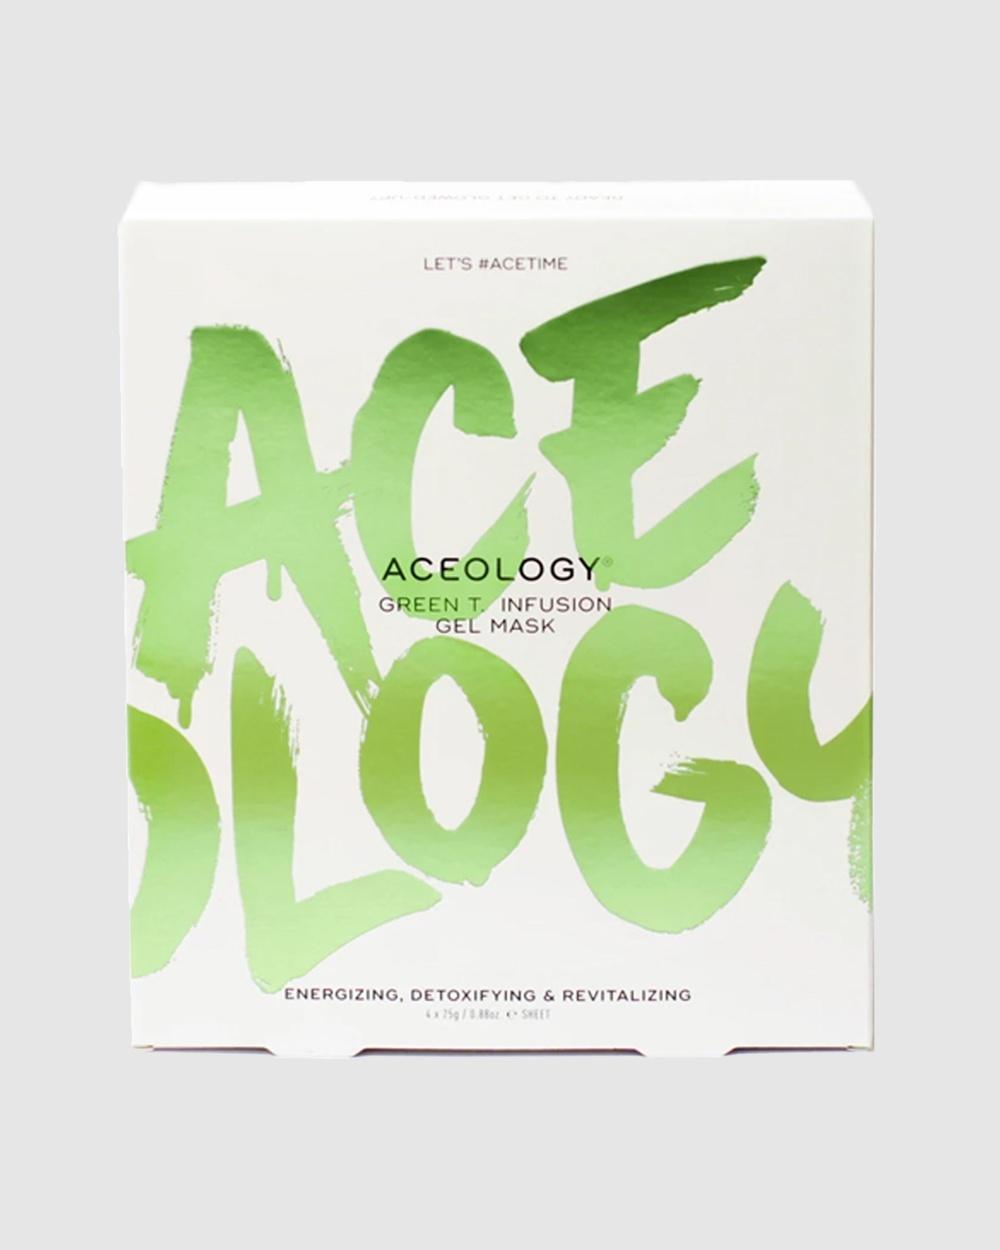 Aceology Green T. Infusion Gel Mask Beauty Green Tea